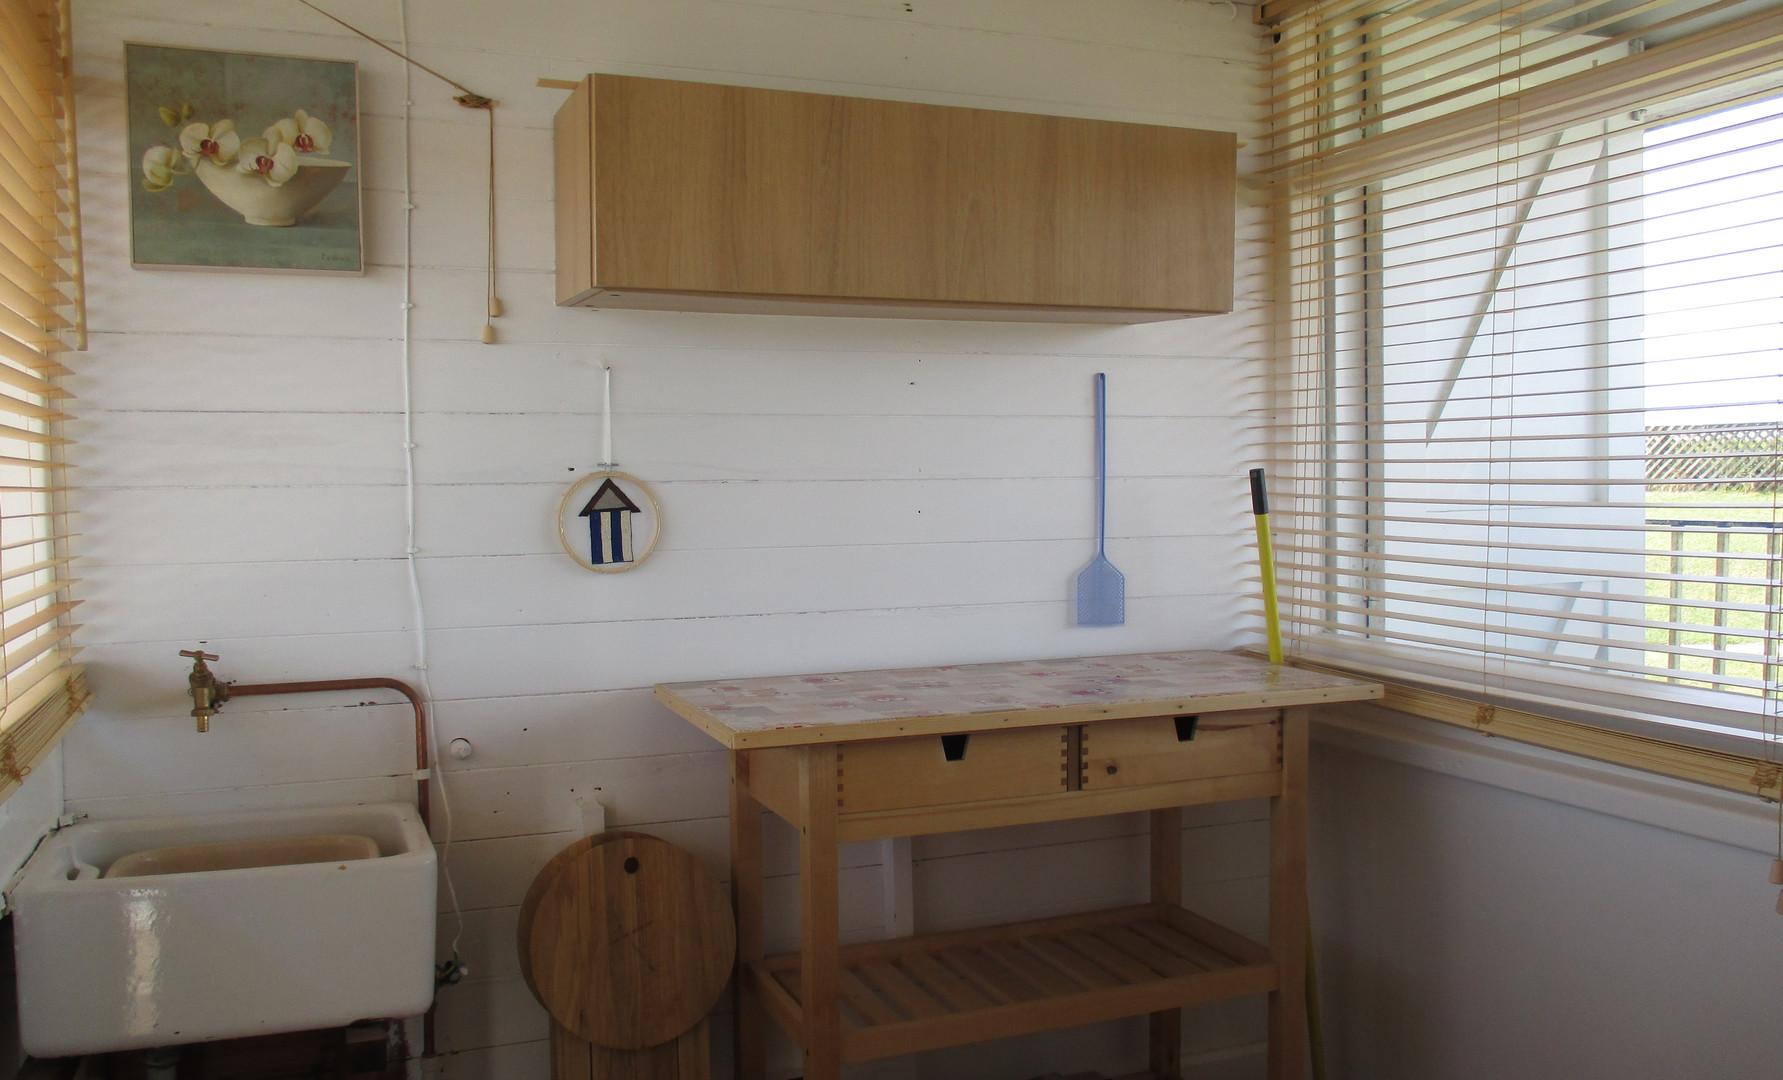 Inside our beach hut it has running water